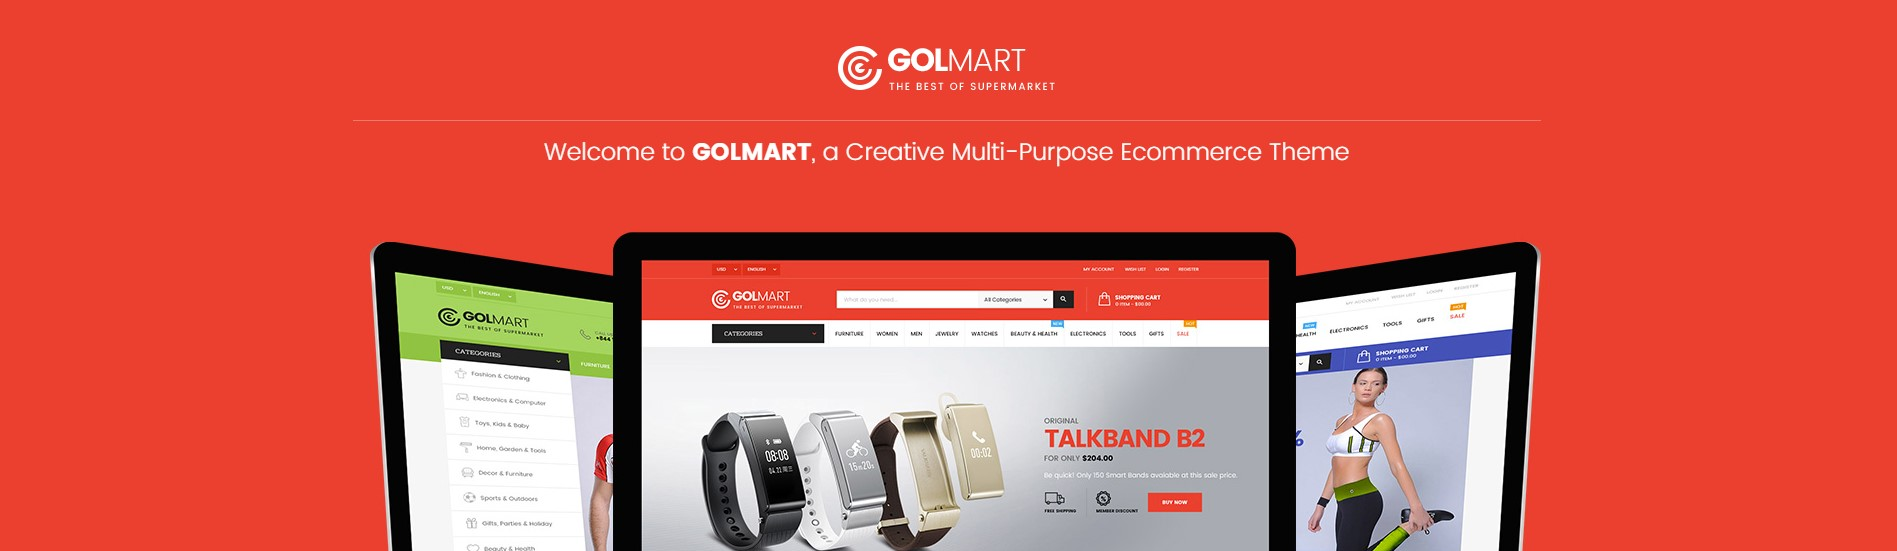 Golmart Supermarket WordPress Theme